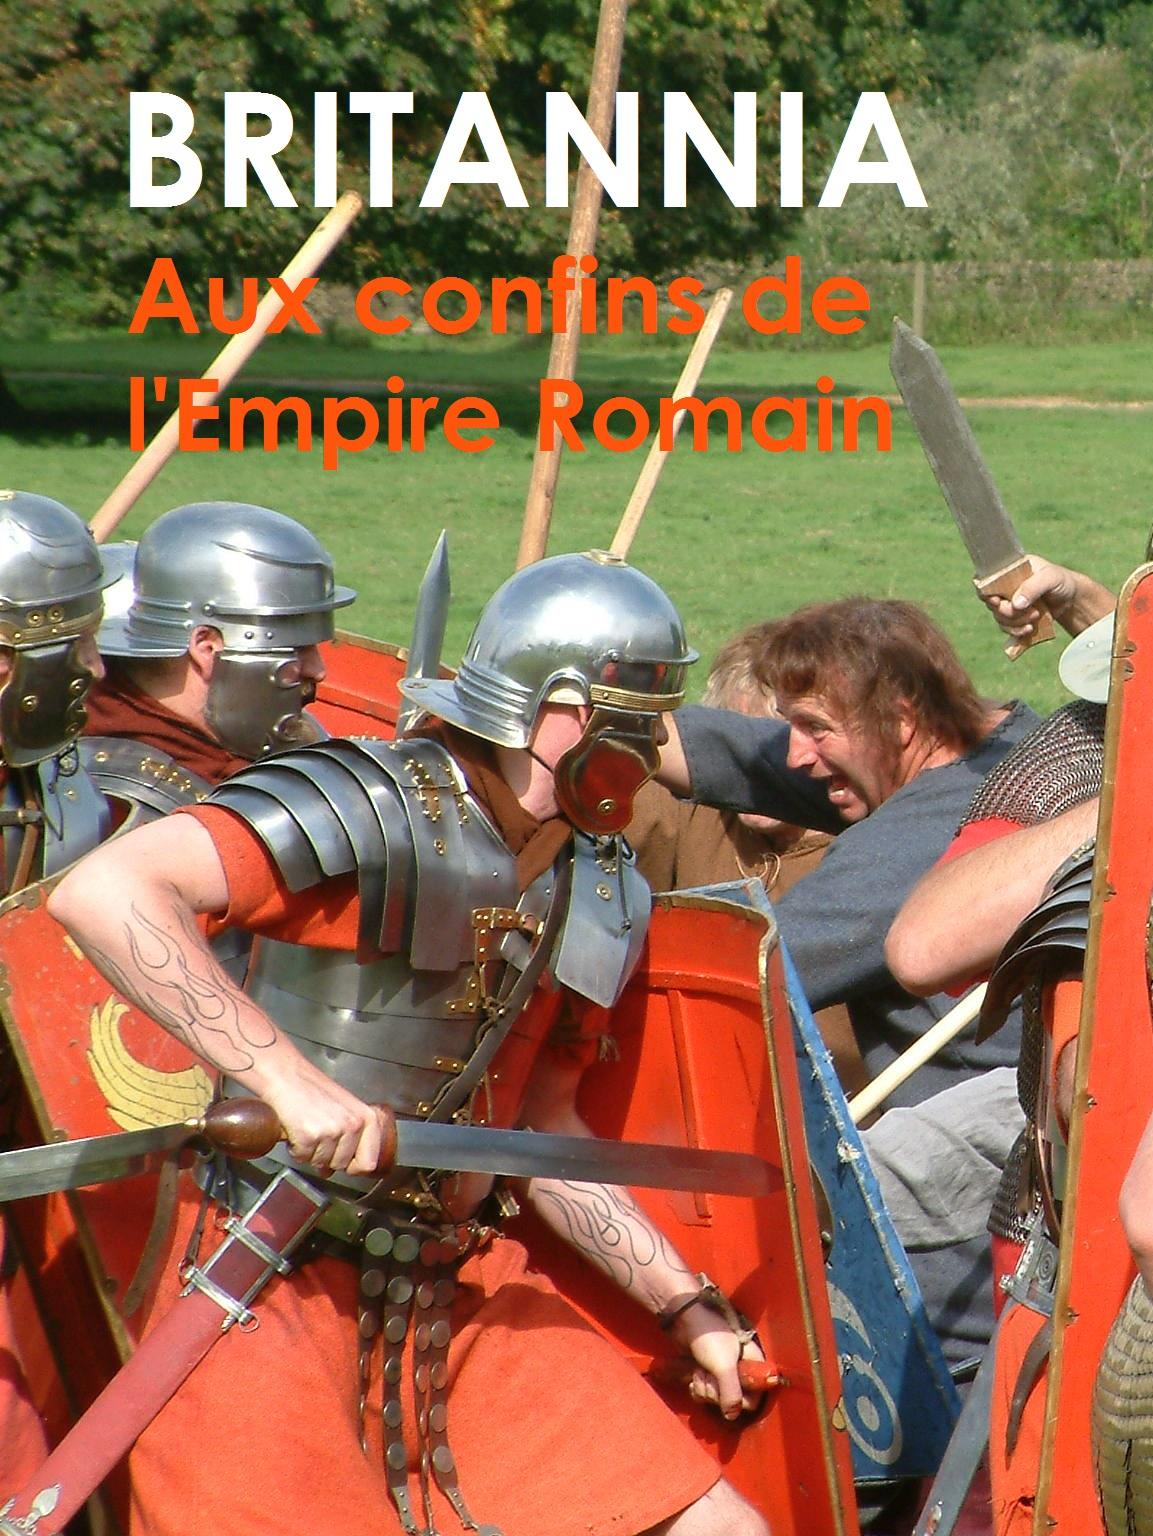 Britannia - Aux confins de l'Empire Romain - 2/3 |